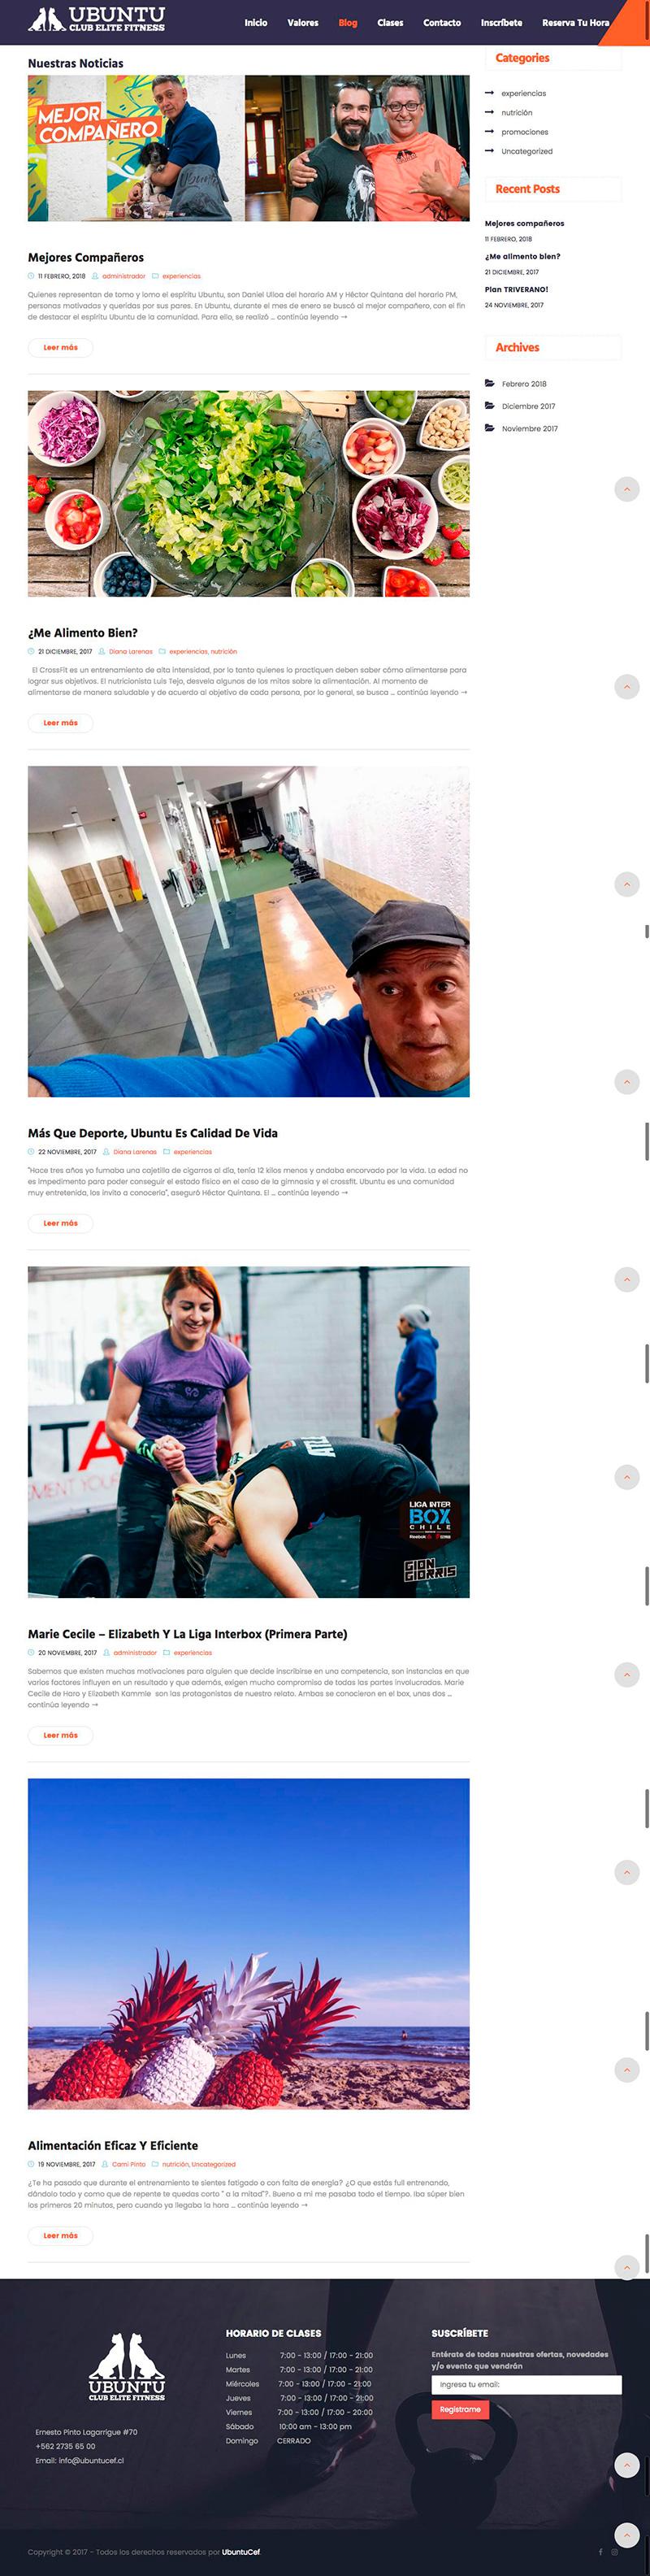 blog_ubuntu